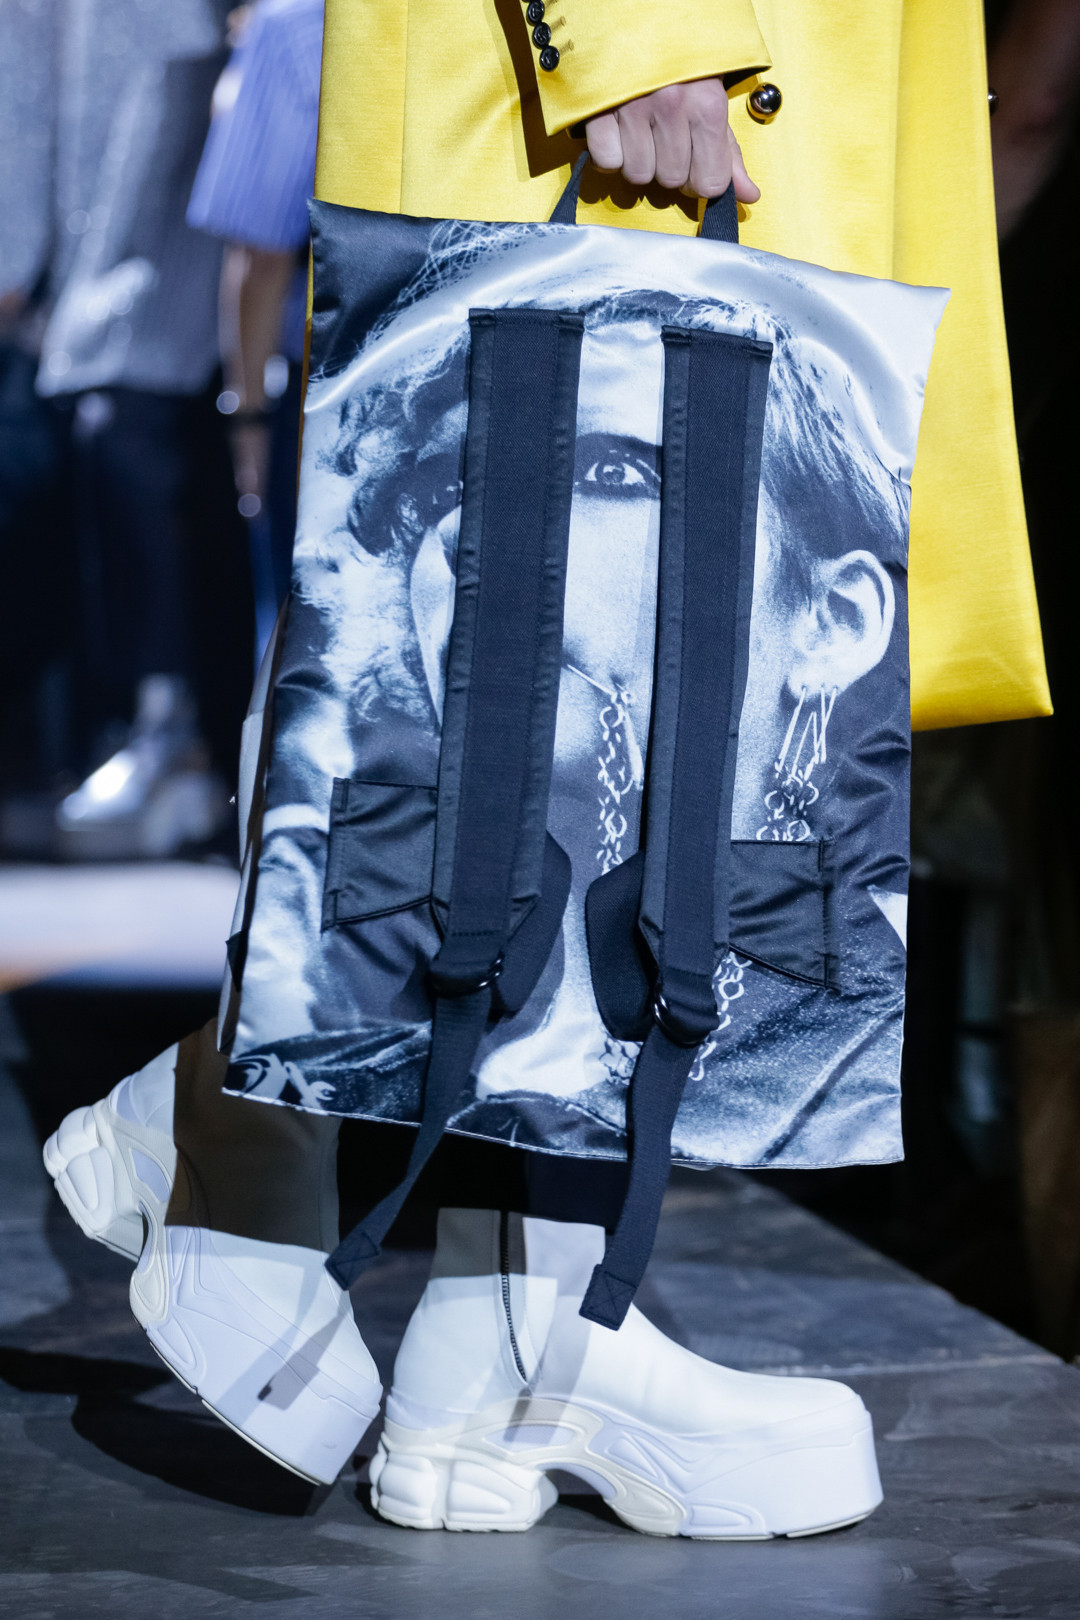 Raf Simons x adidas' Spring/Summer 2019